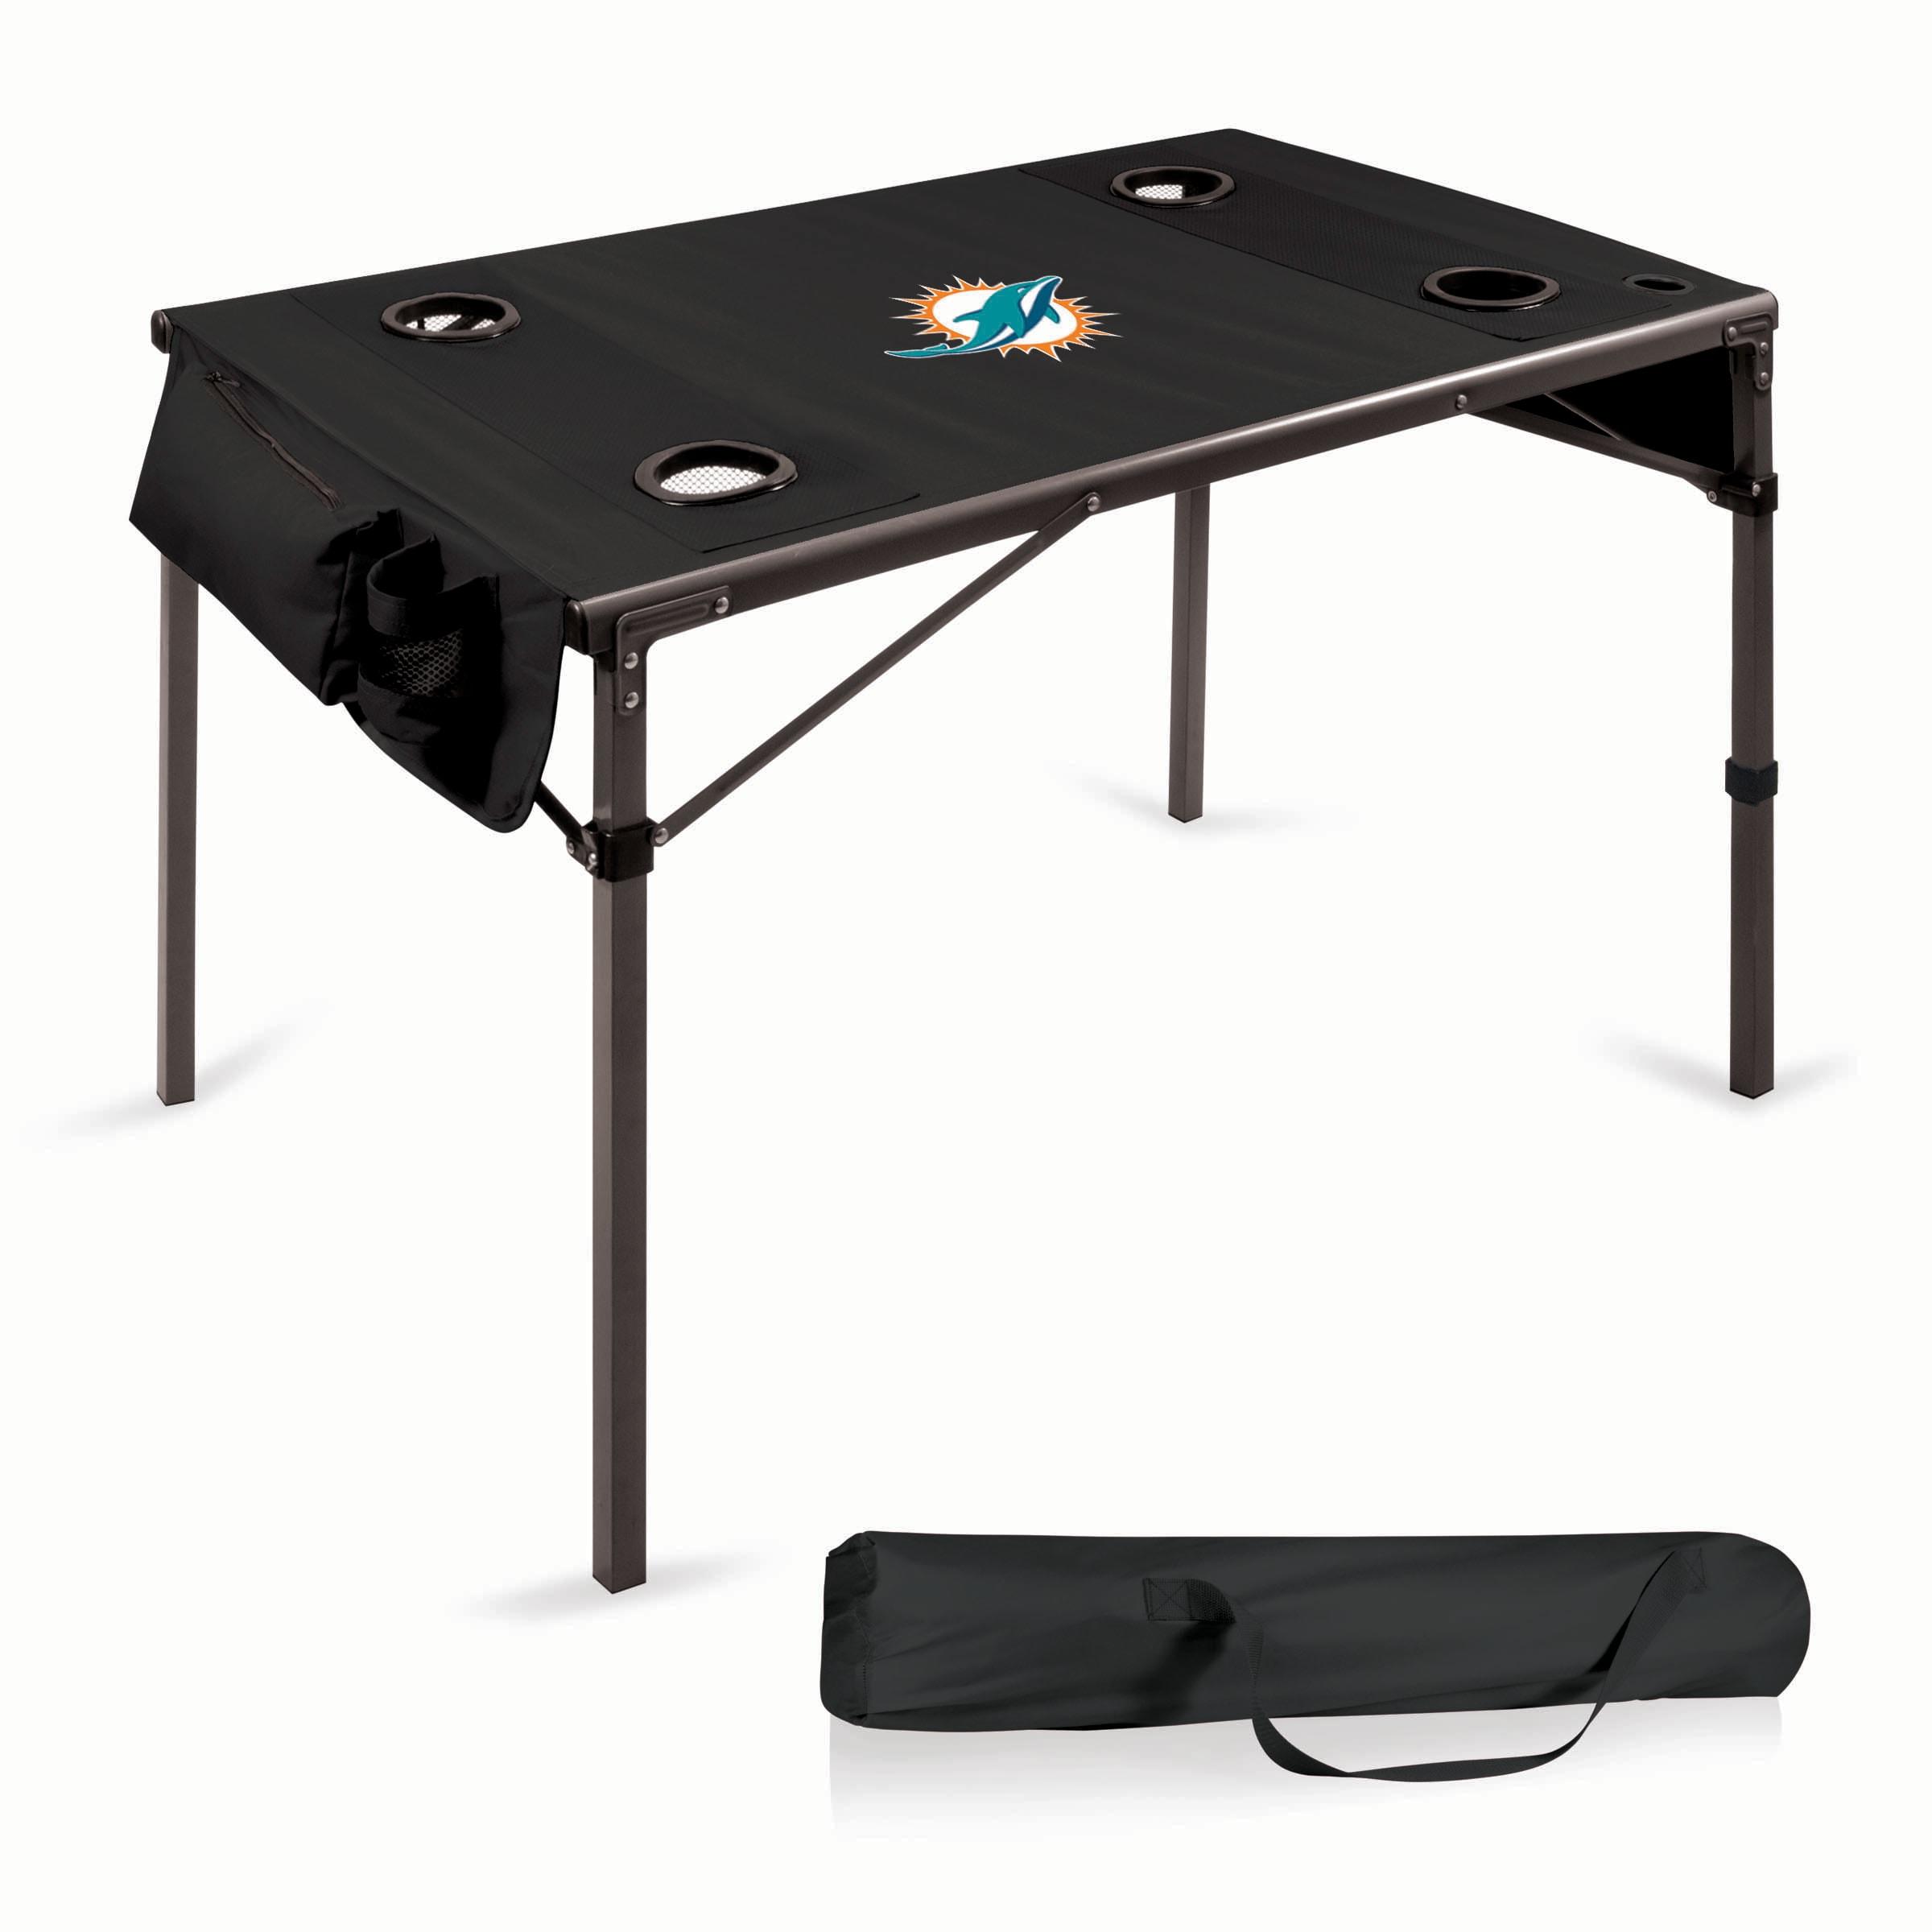 Miami Dolphins Portable Folding Travel Table - Black